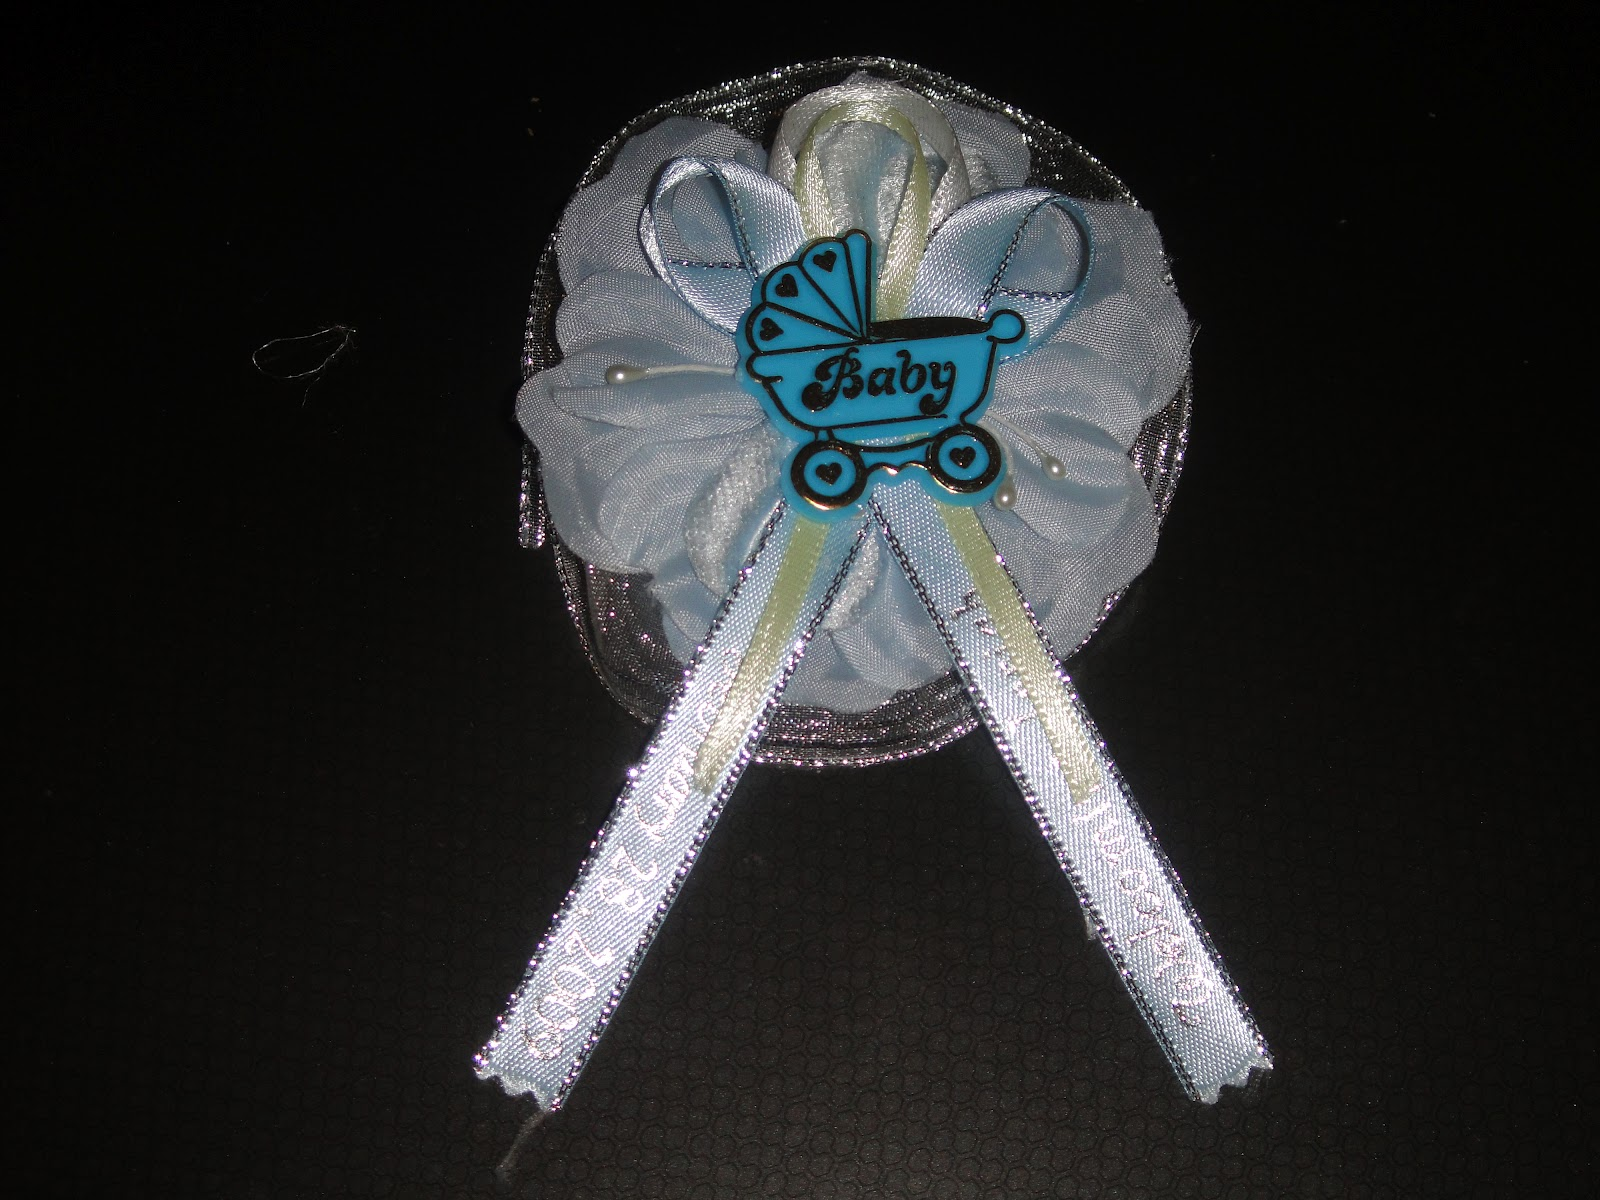 jesz creative designs event planning baby shower pins favors